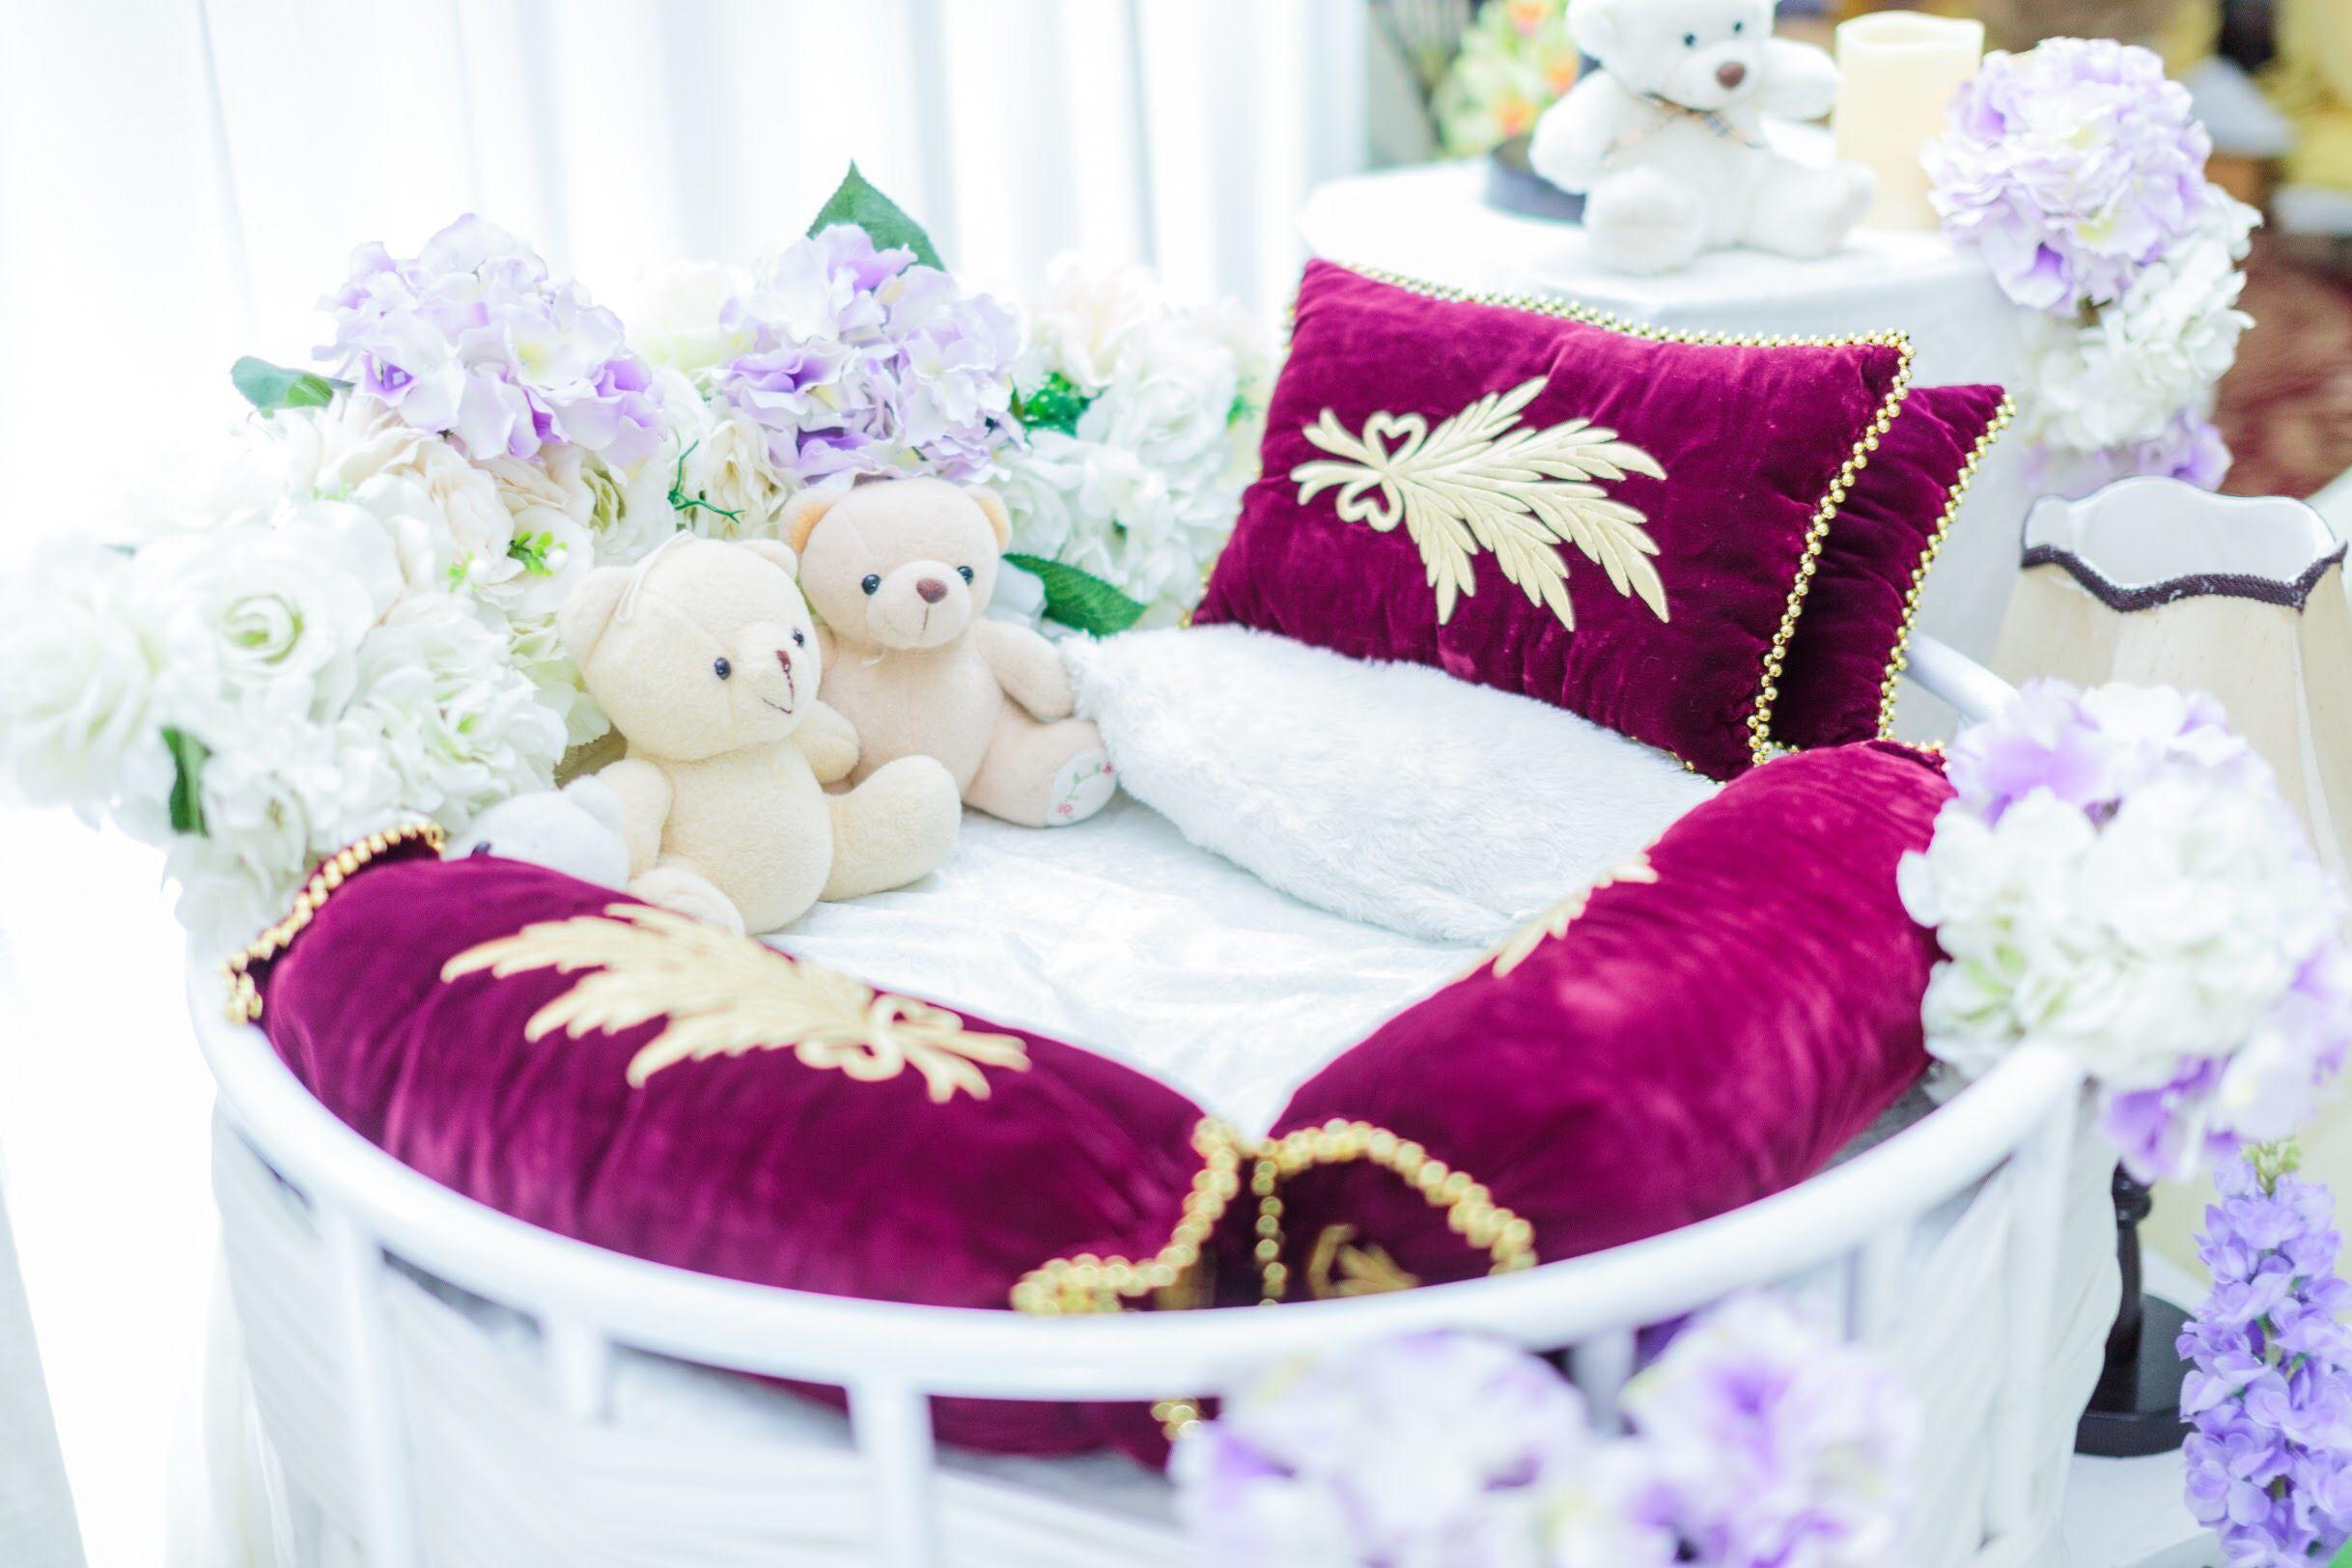 (FB D'alis Deco Weddings) (insta dalisdeco) photographer